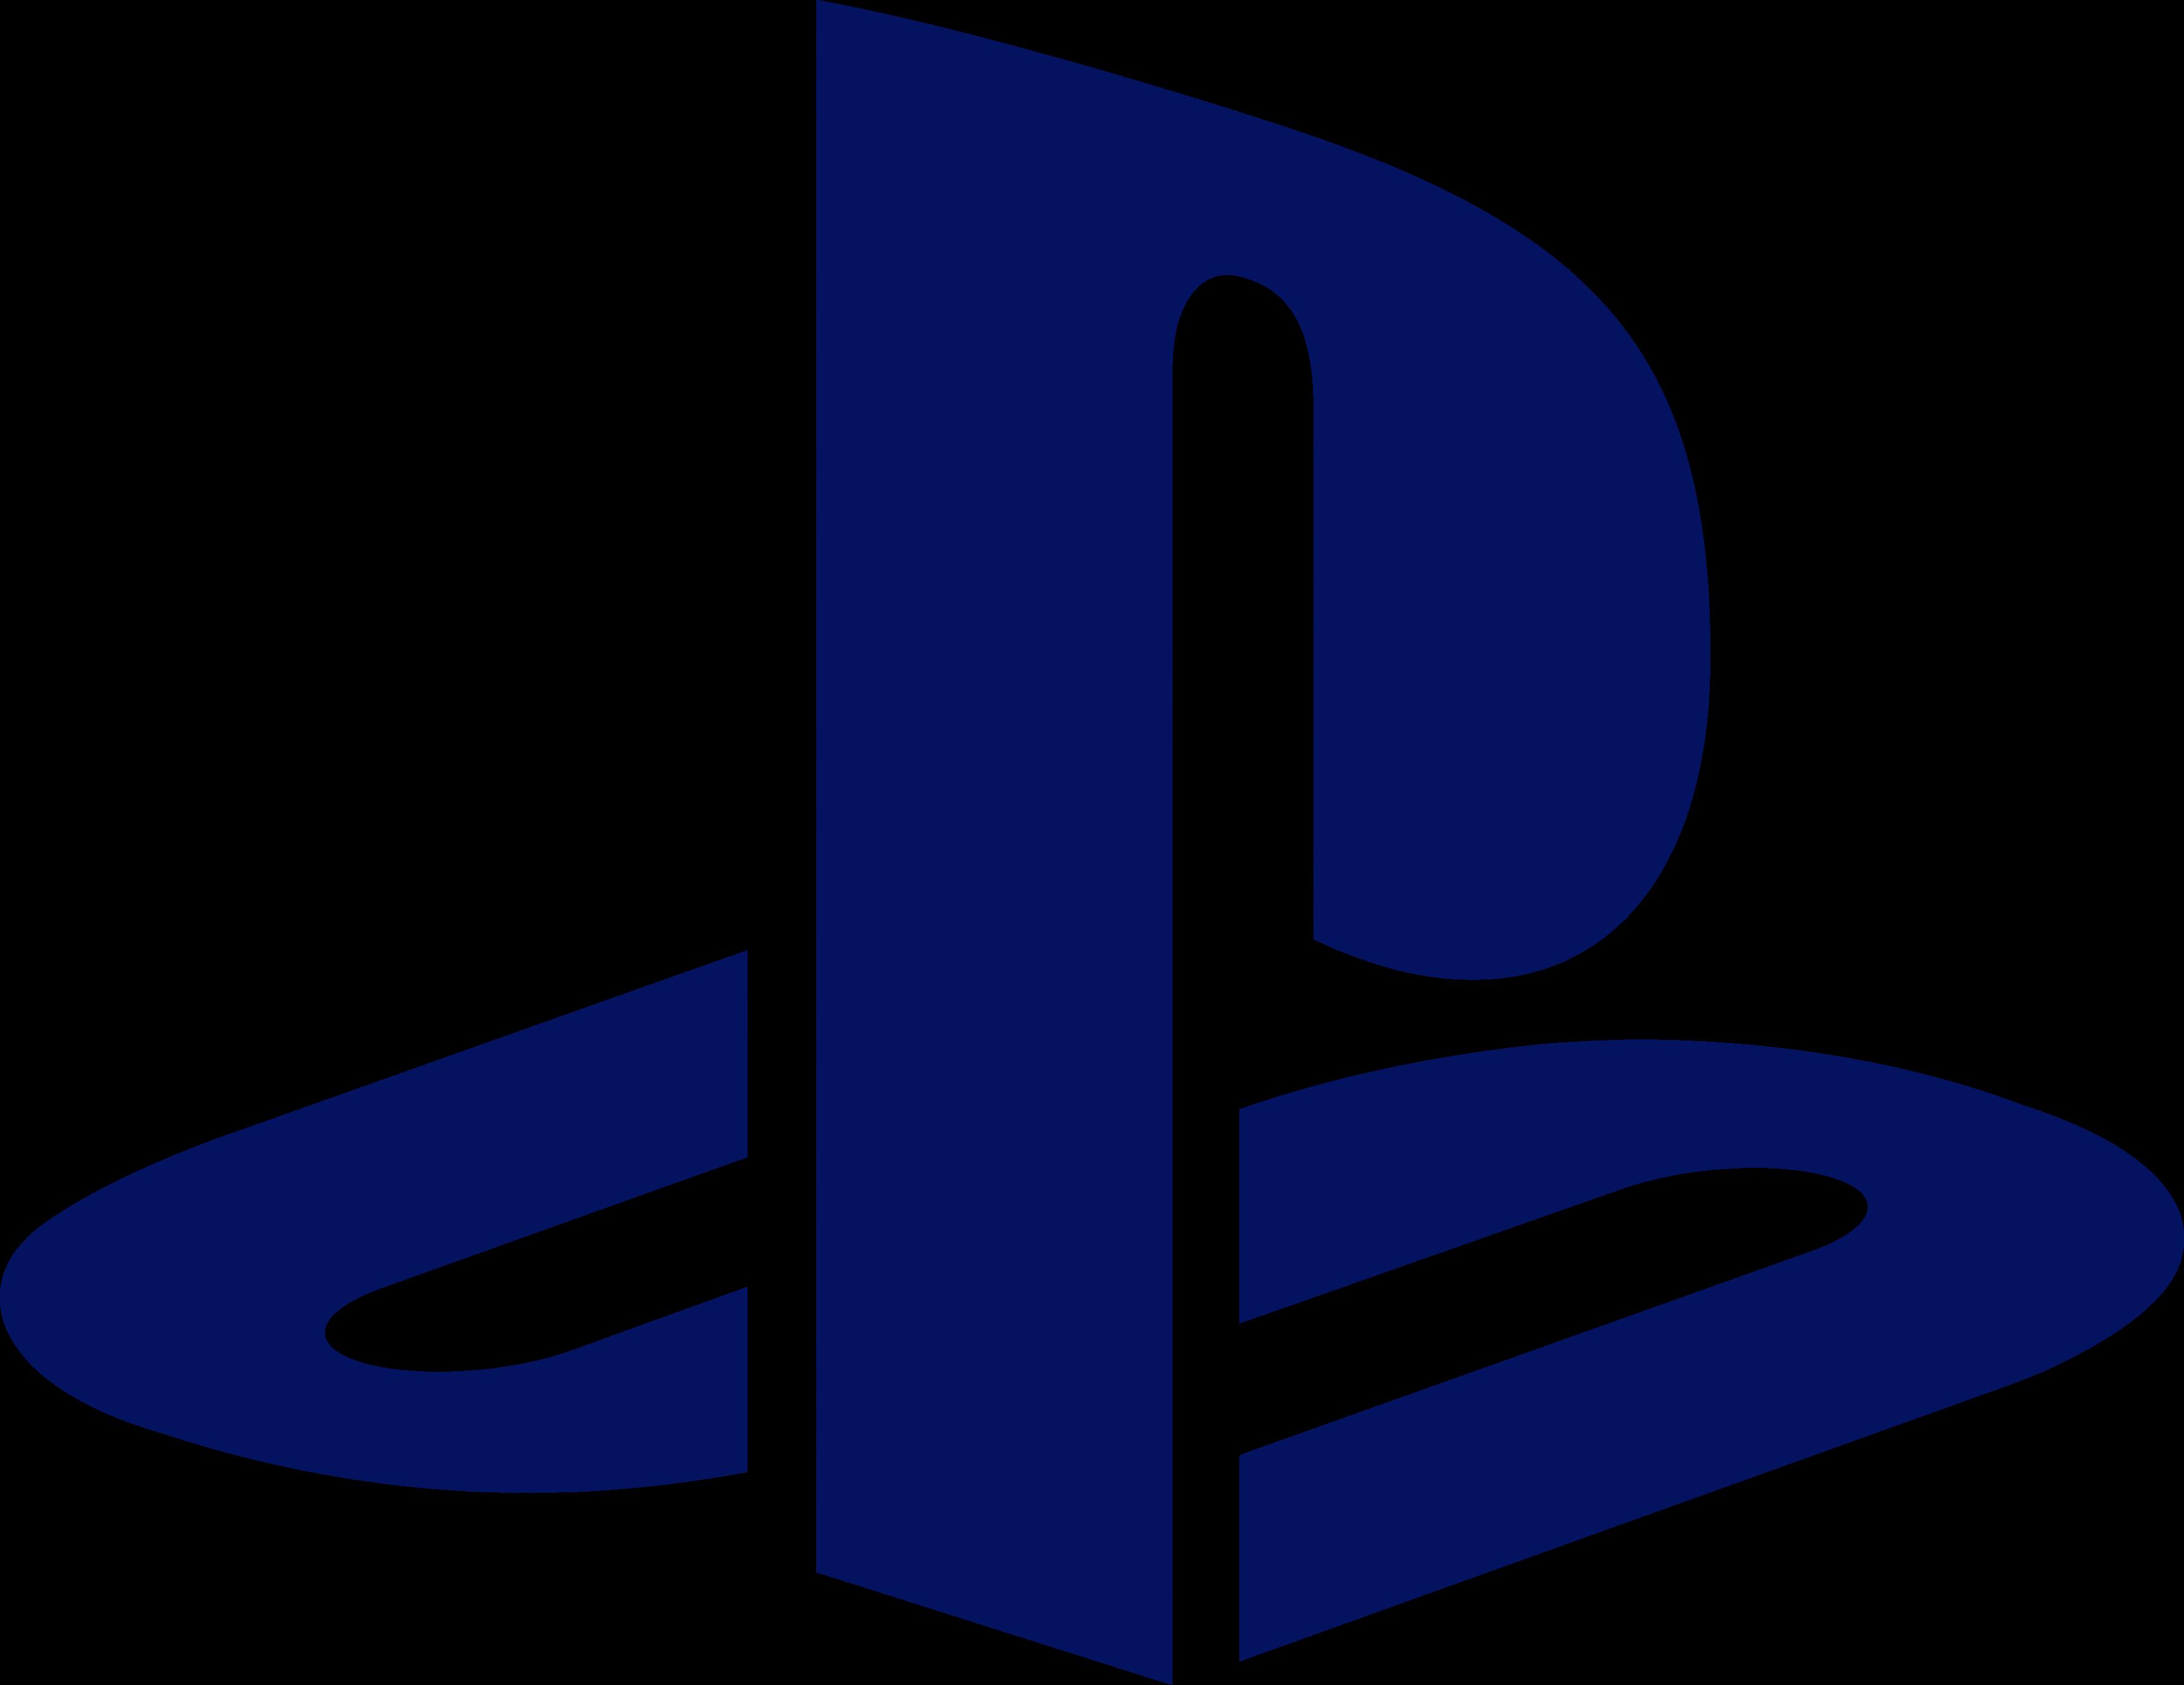 Ps clipart logo clipart library download Playstation 4 Logo Ndash Ps4 Logodownloadorg Download ... clipart library download